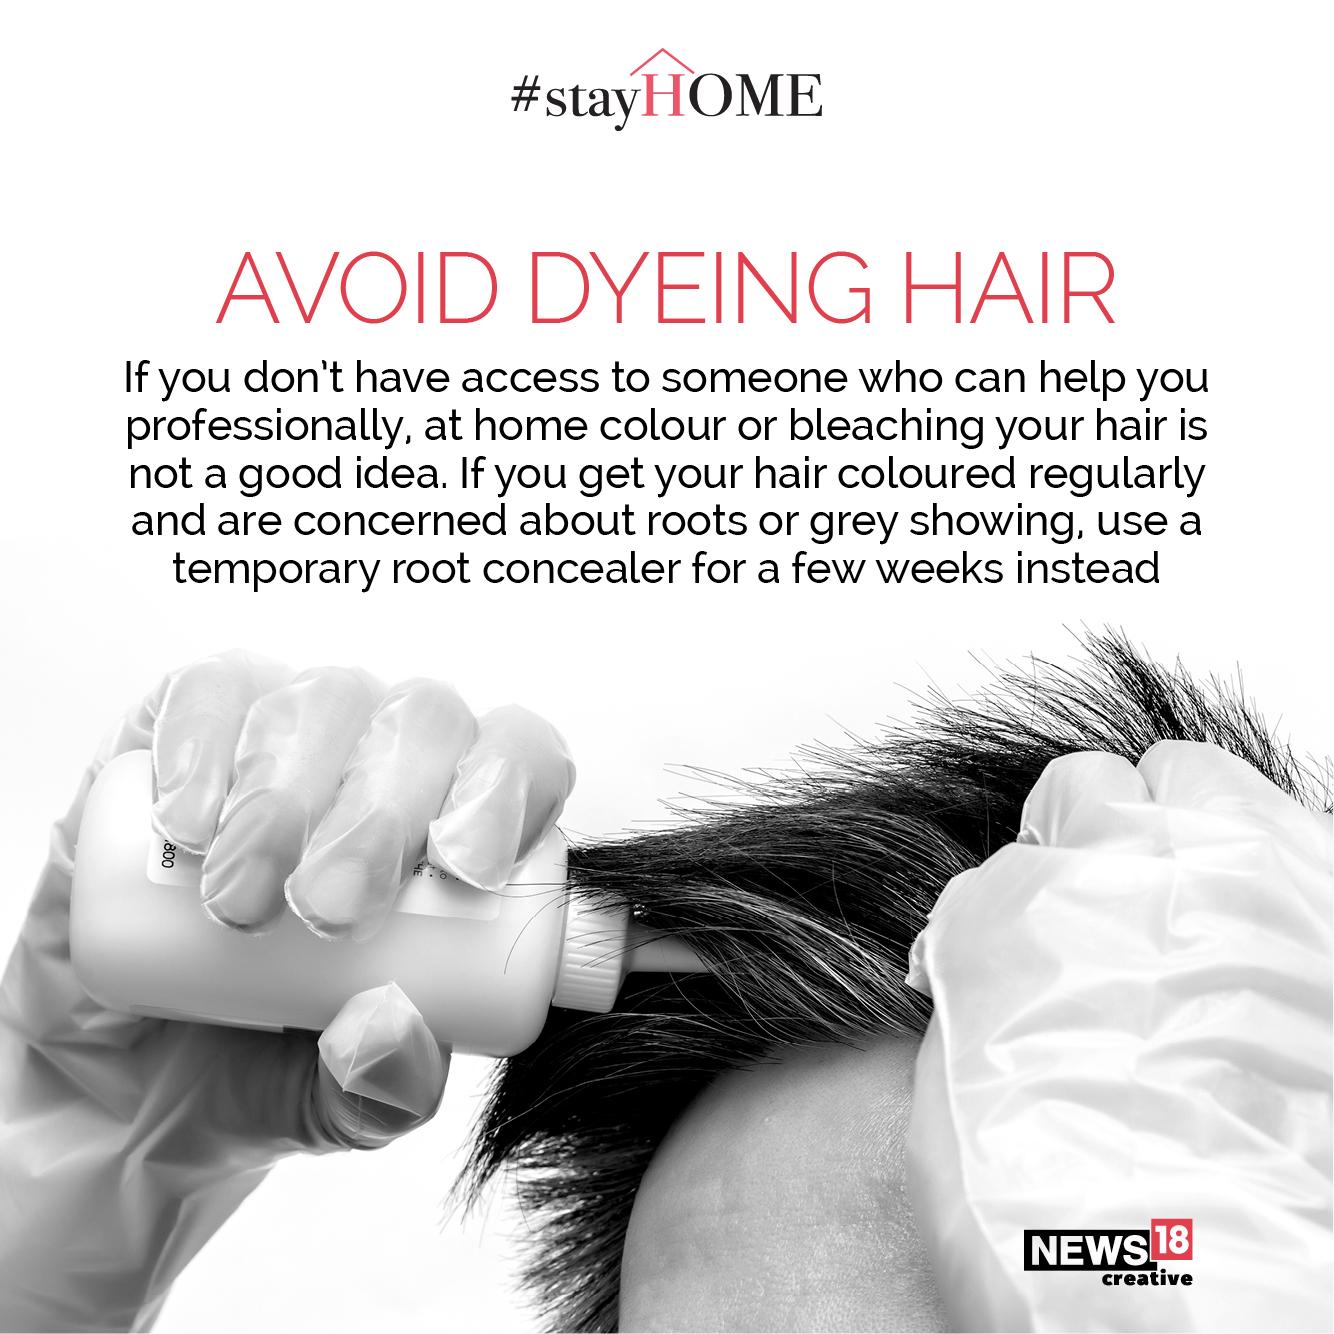 Tip 5 Avoid dyeing hair (Image: News18 Creative)